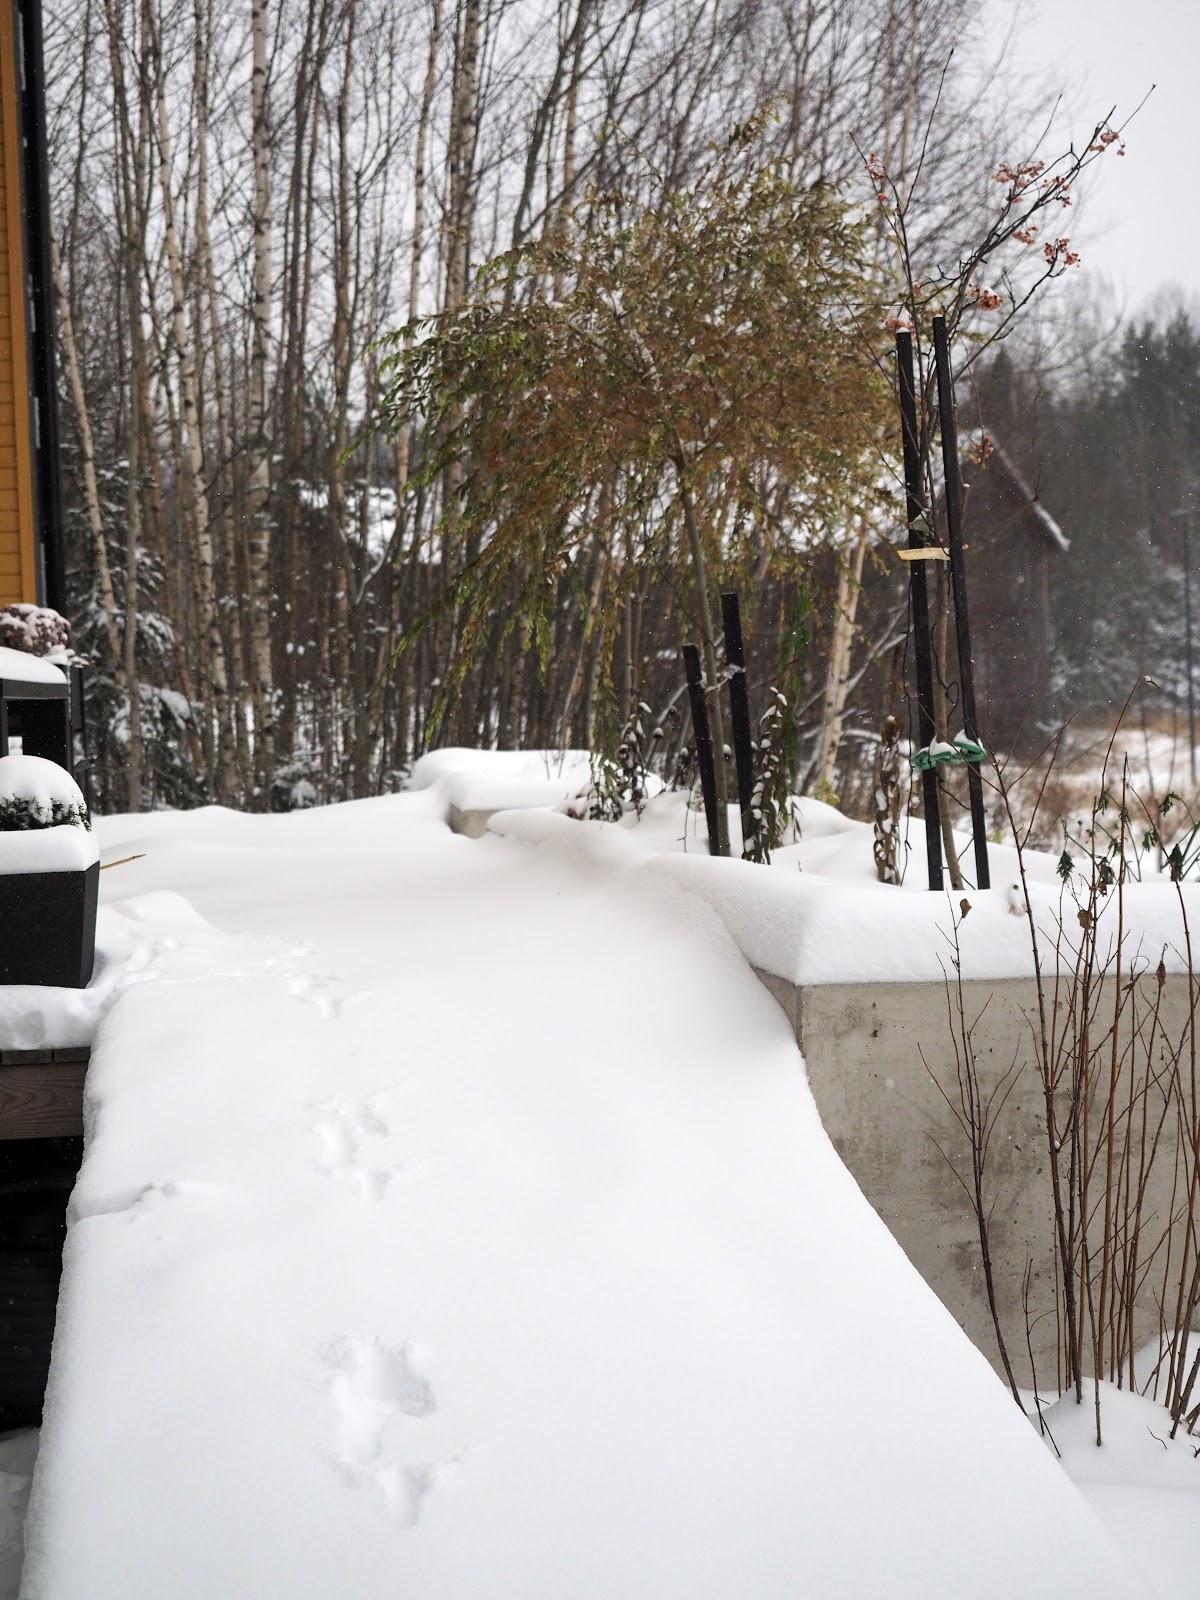 Lunta terassilla, lumi, maisema, marraskuu, talvi